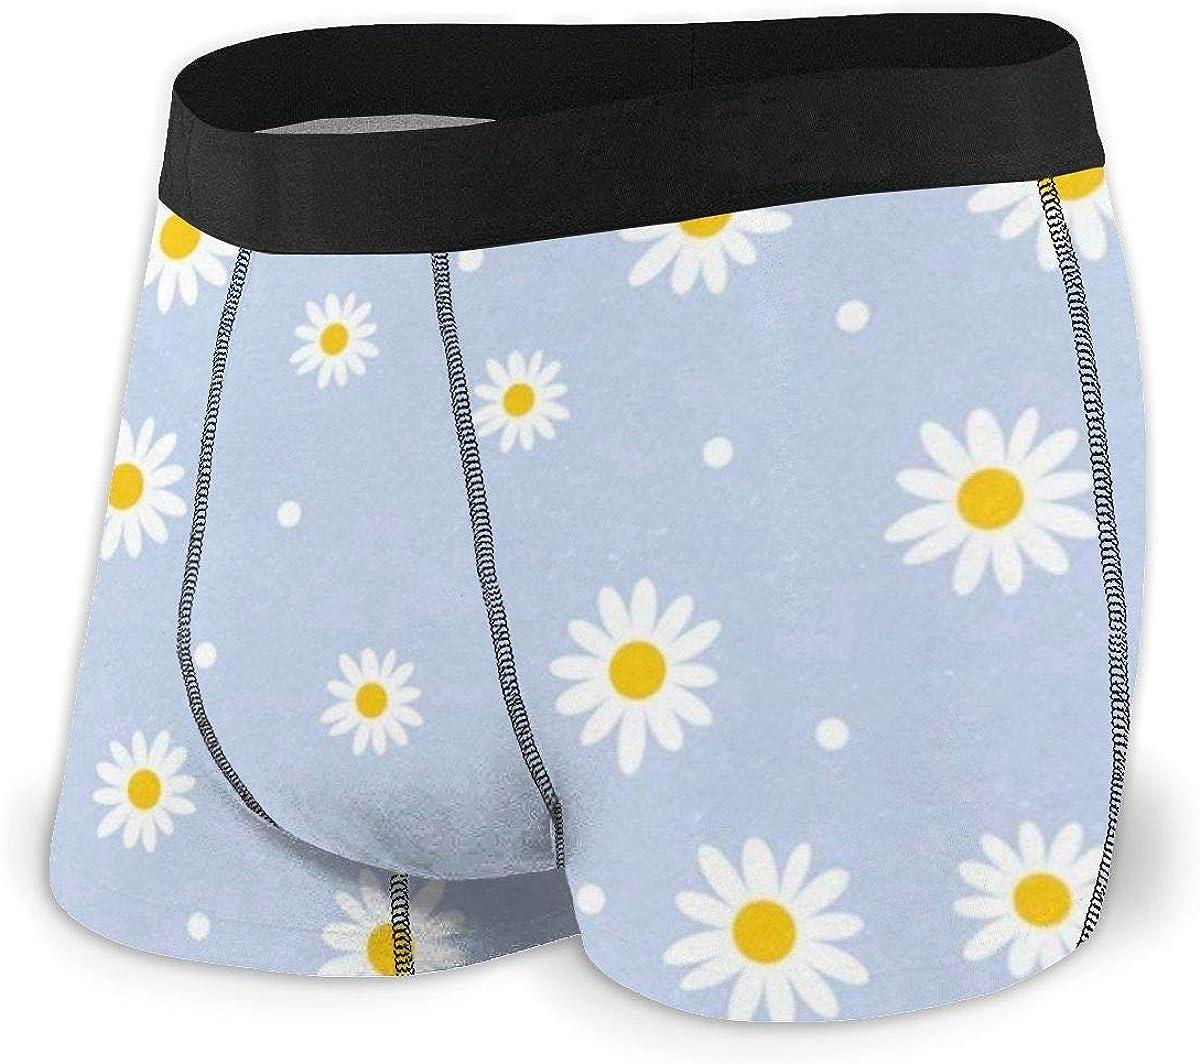 Mens Boxer Briefs Vintage Cute Daisy Lovely Breathable Underwear